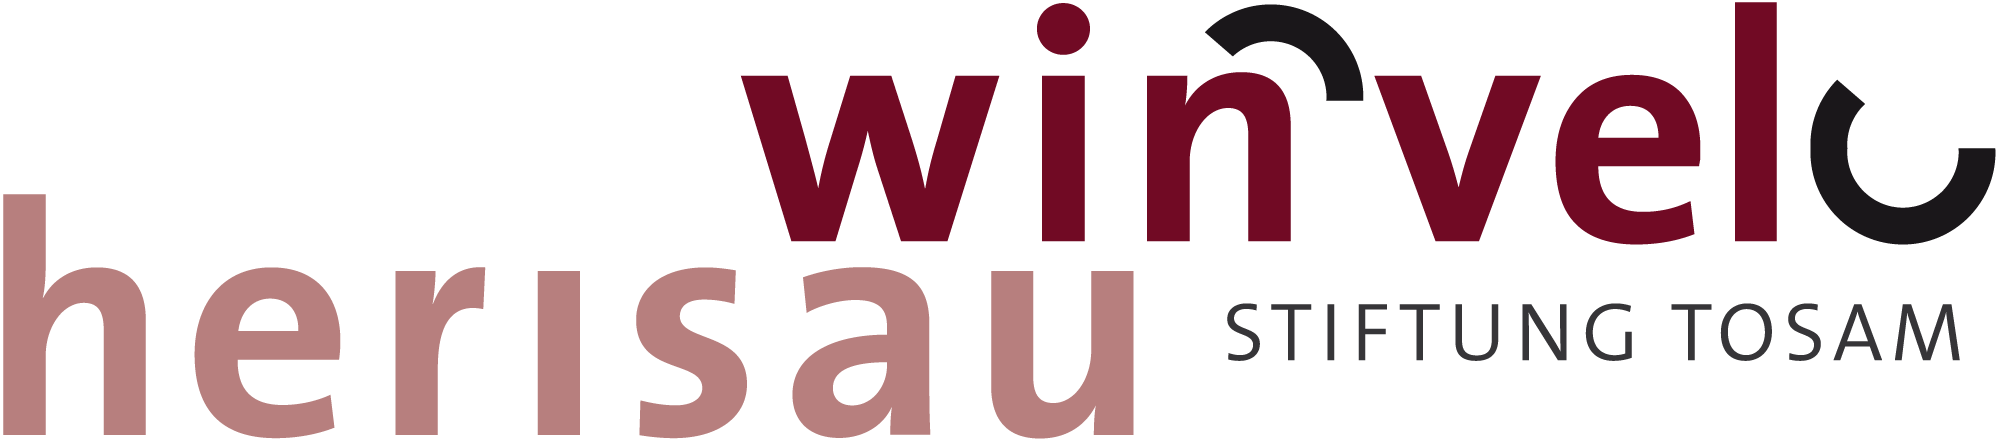 WinVelo Herisau Stiftung Tosam